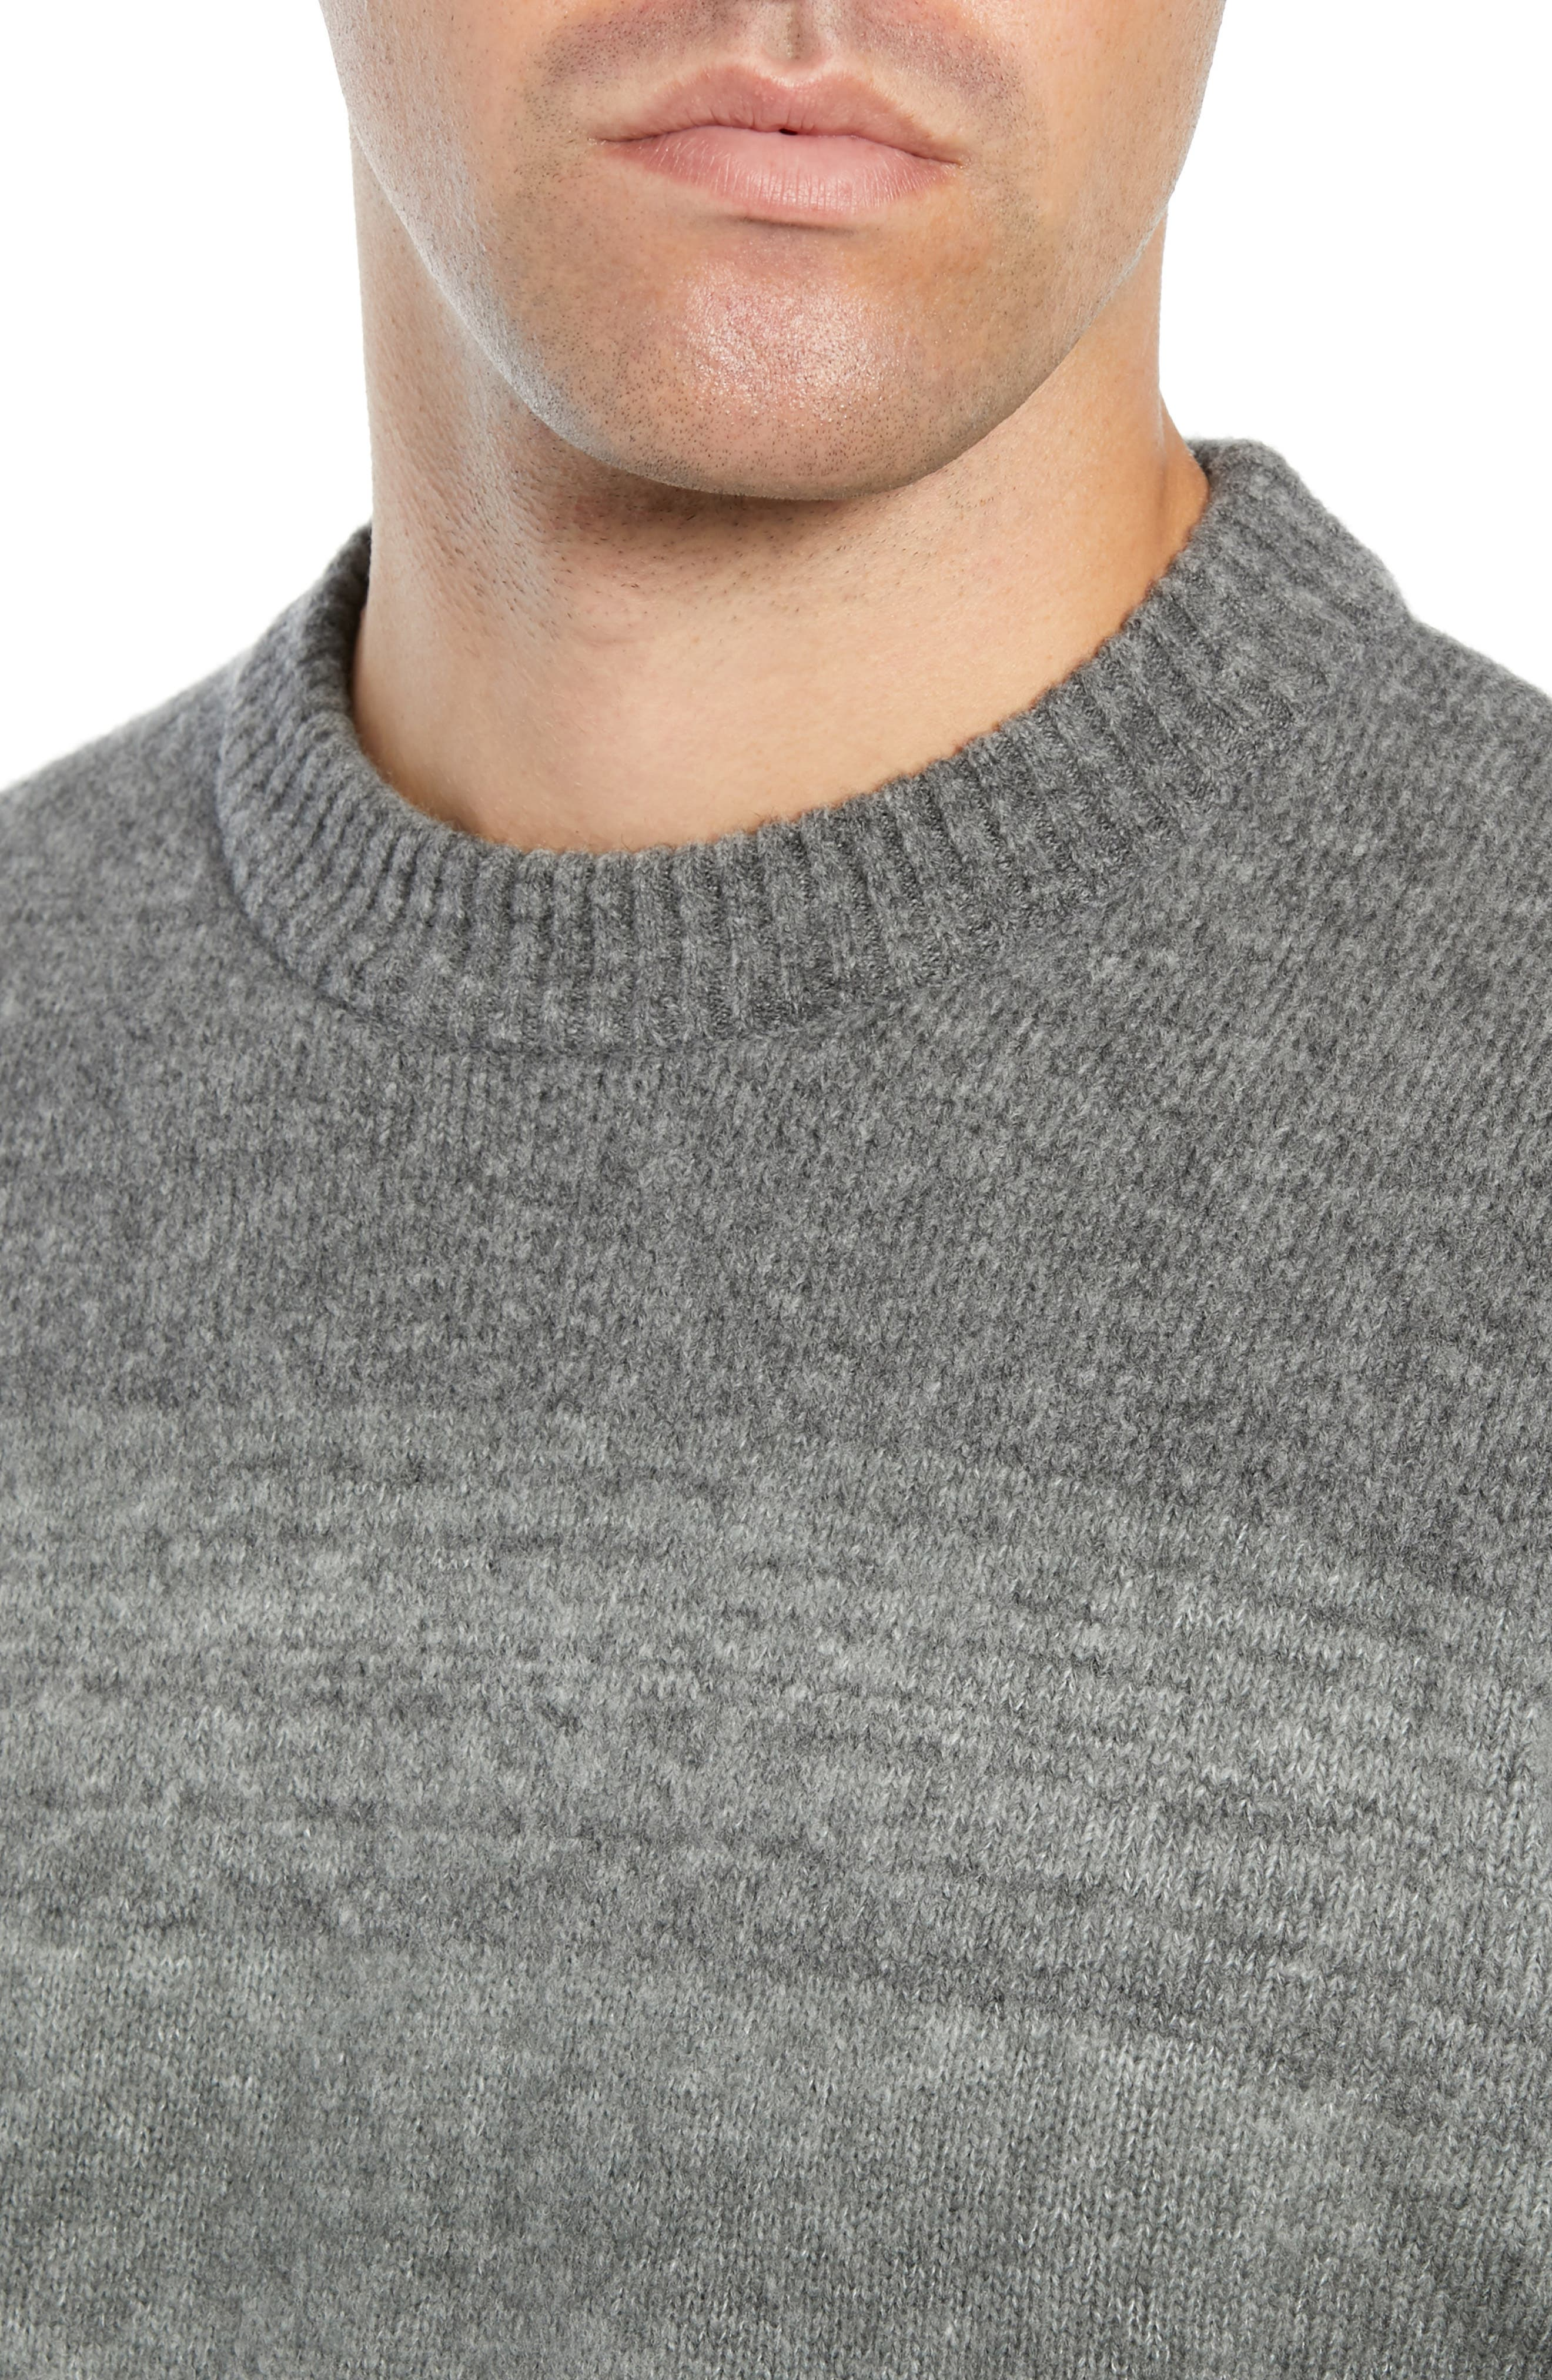 Ecardo Dégradé Virgin Wool Blend Sweater,                             Alternate thumbnail 4, color,                             GREY